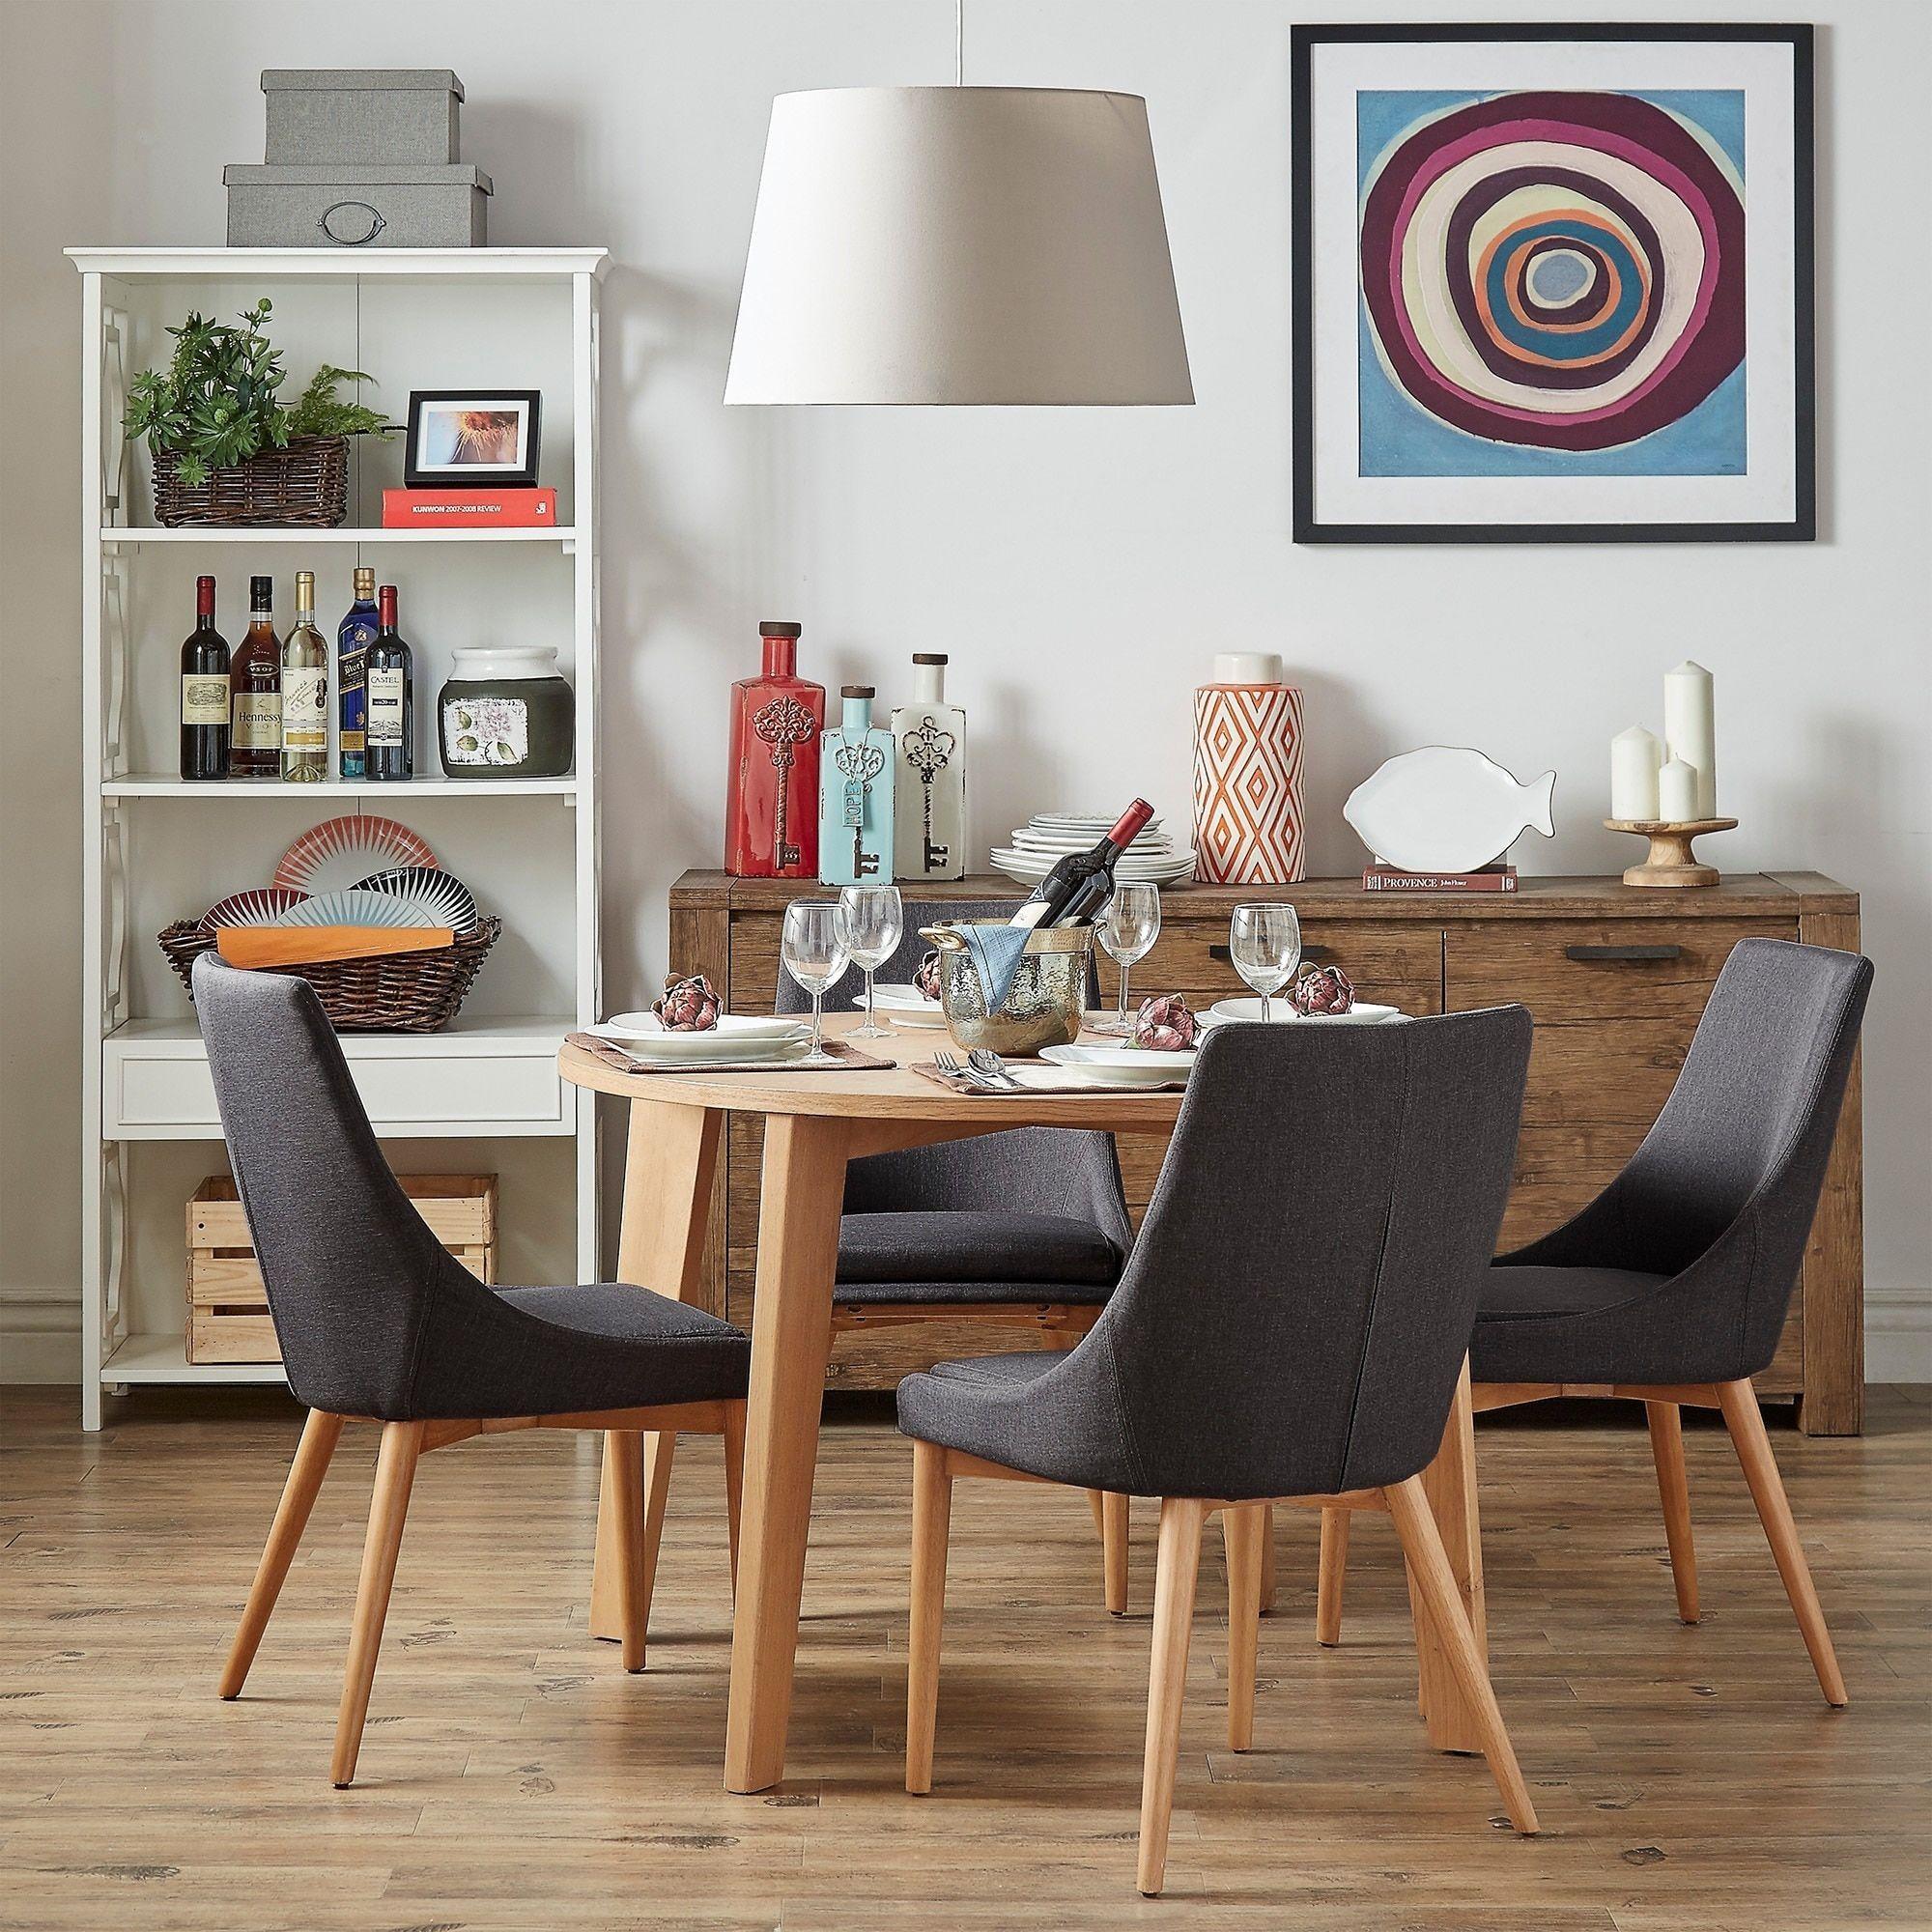 Sasha Oak Angled Leg Round 5-piece Dining Set iNSPIRE Q Modern (Dark Grey)